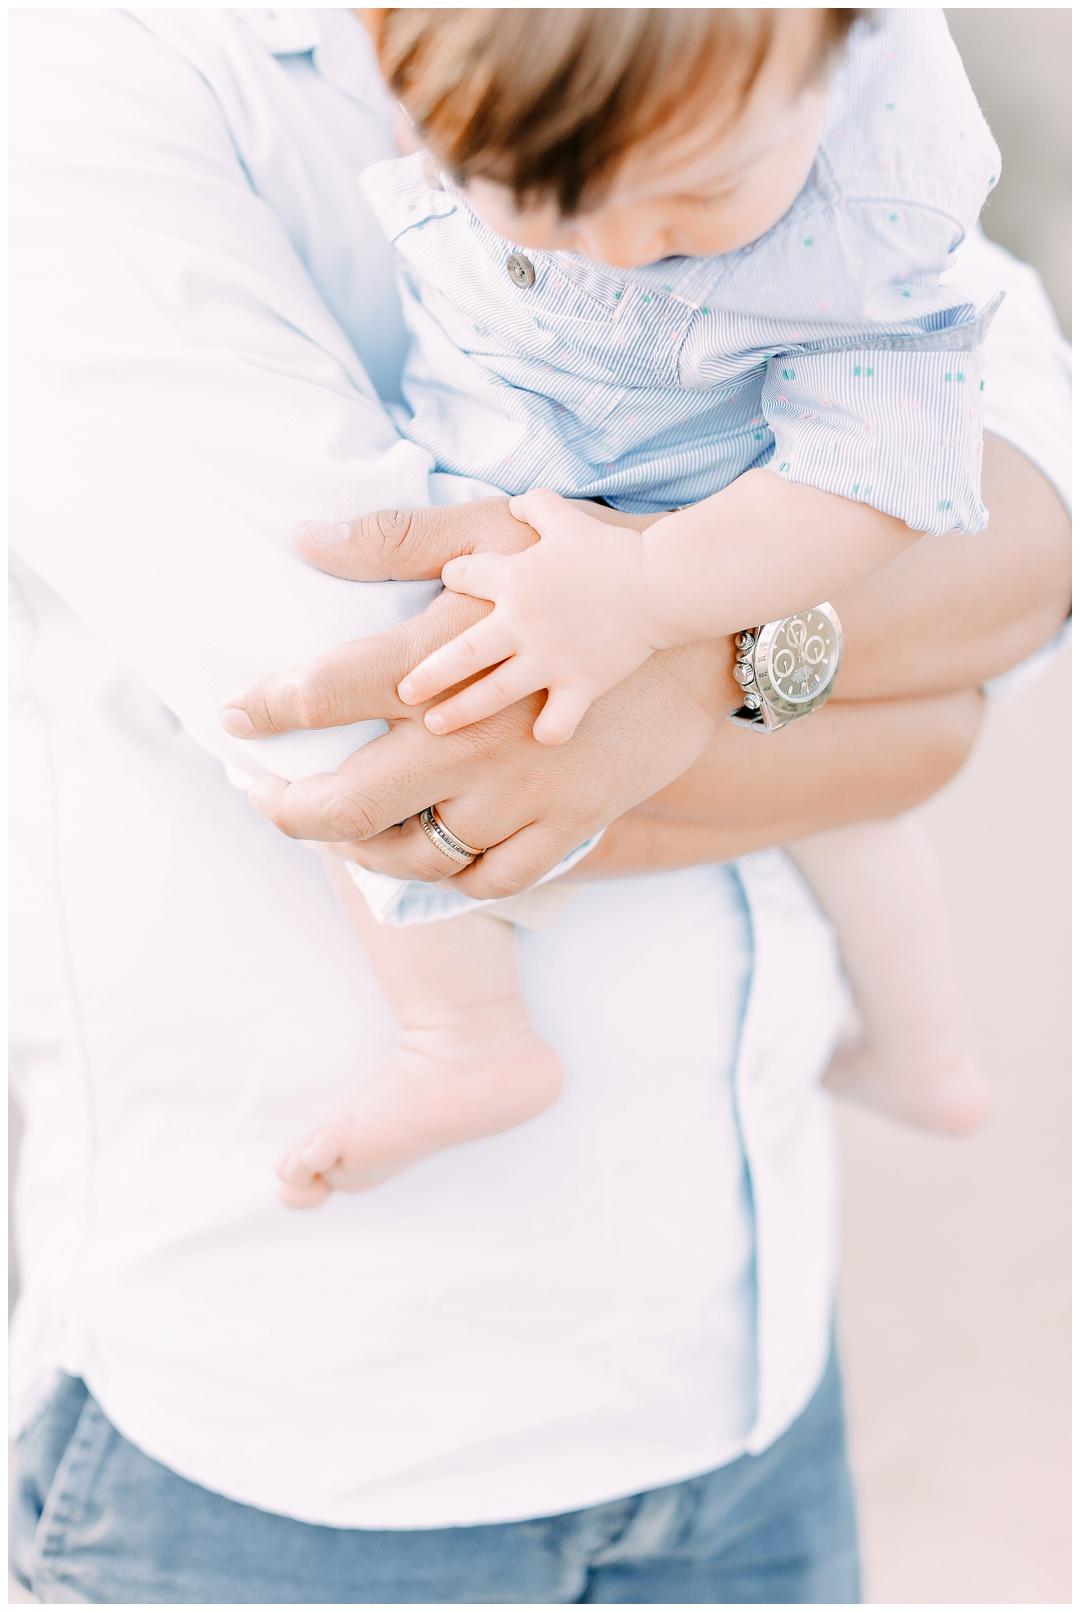 Newport_Beach_Maternity_Photographer_Orange_County_Maternity_Photography_Cori_Kleckner_Photography_Orange_County_Family_Photographer_Beach_Maternity_Session_1112.jpg